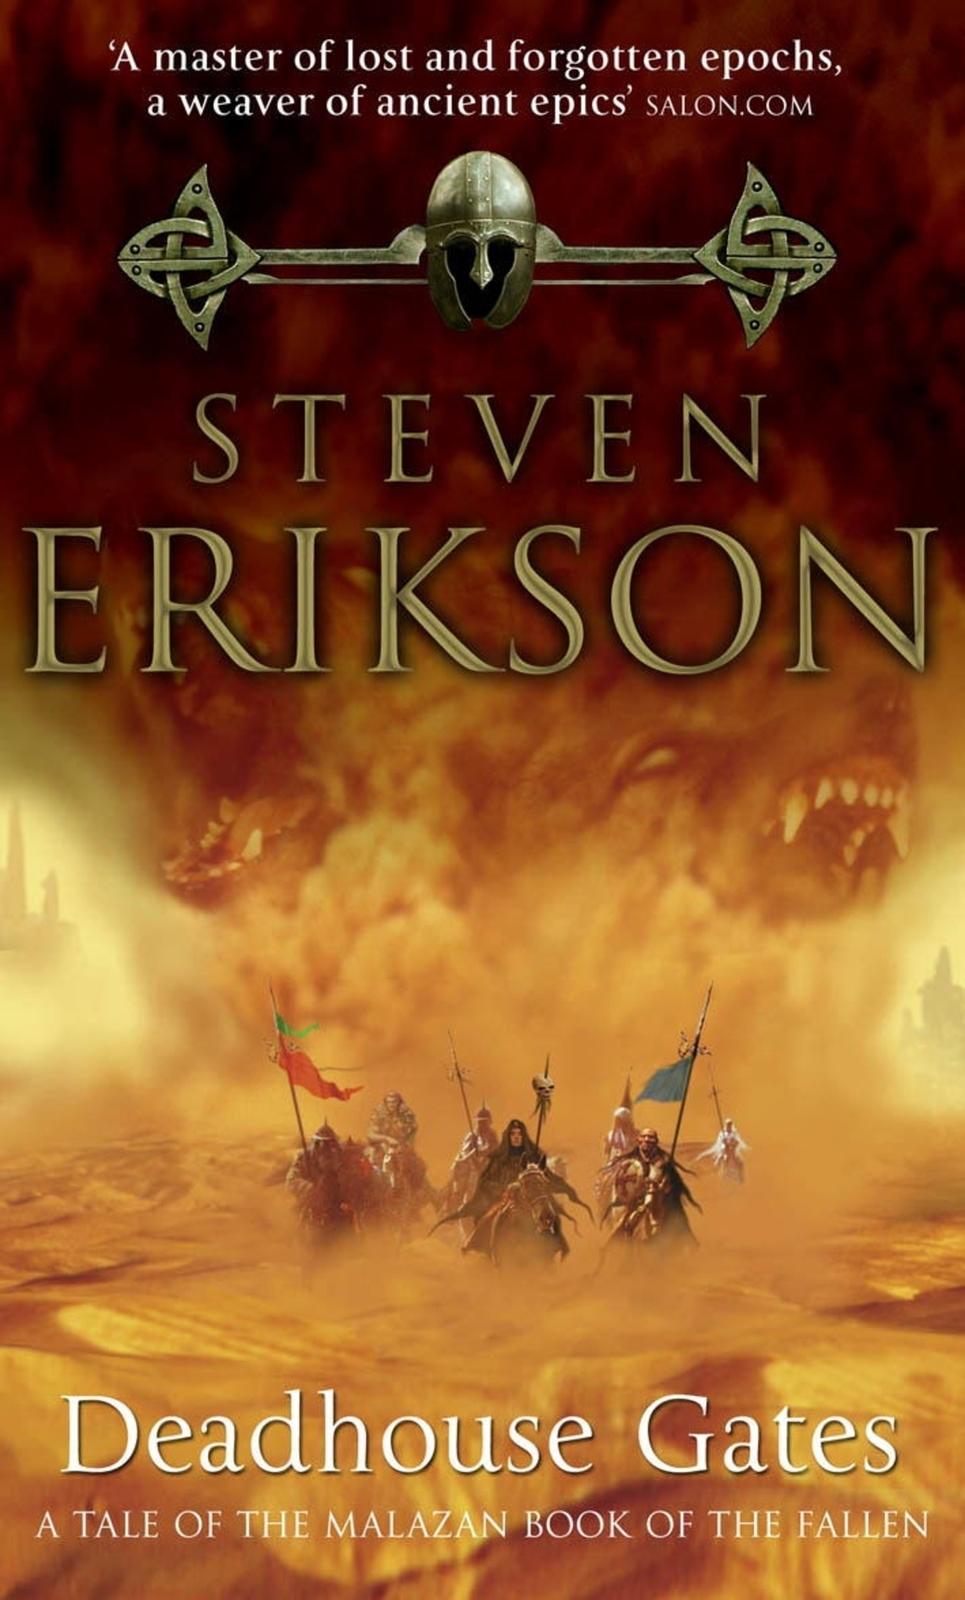 Deadhouse Gates (Malazan Book of the Fallen #2) by Steven Erikson image